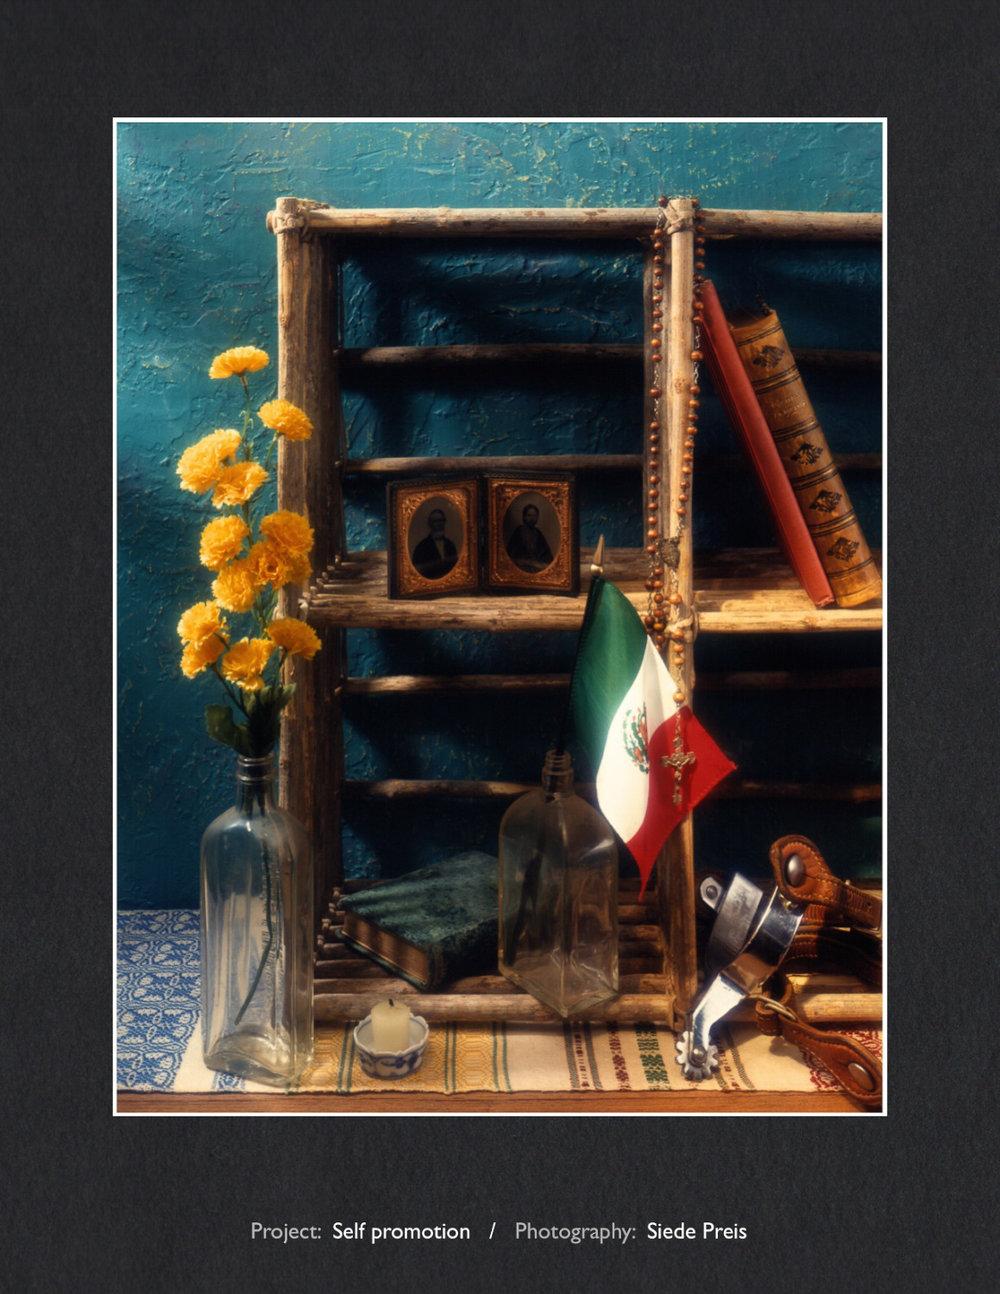 Siede-Preis-PhotographyMexican Still Life.jpg